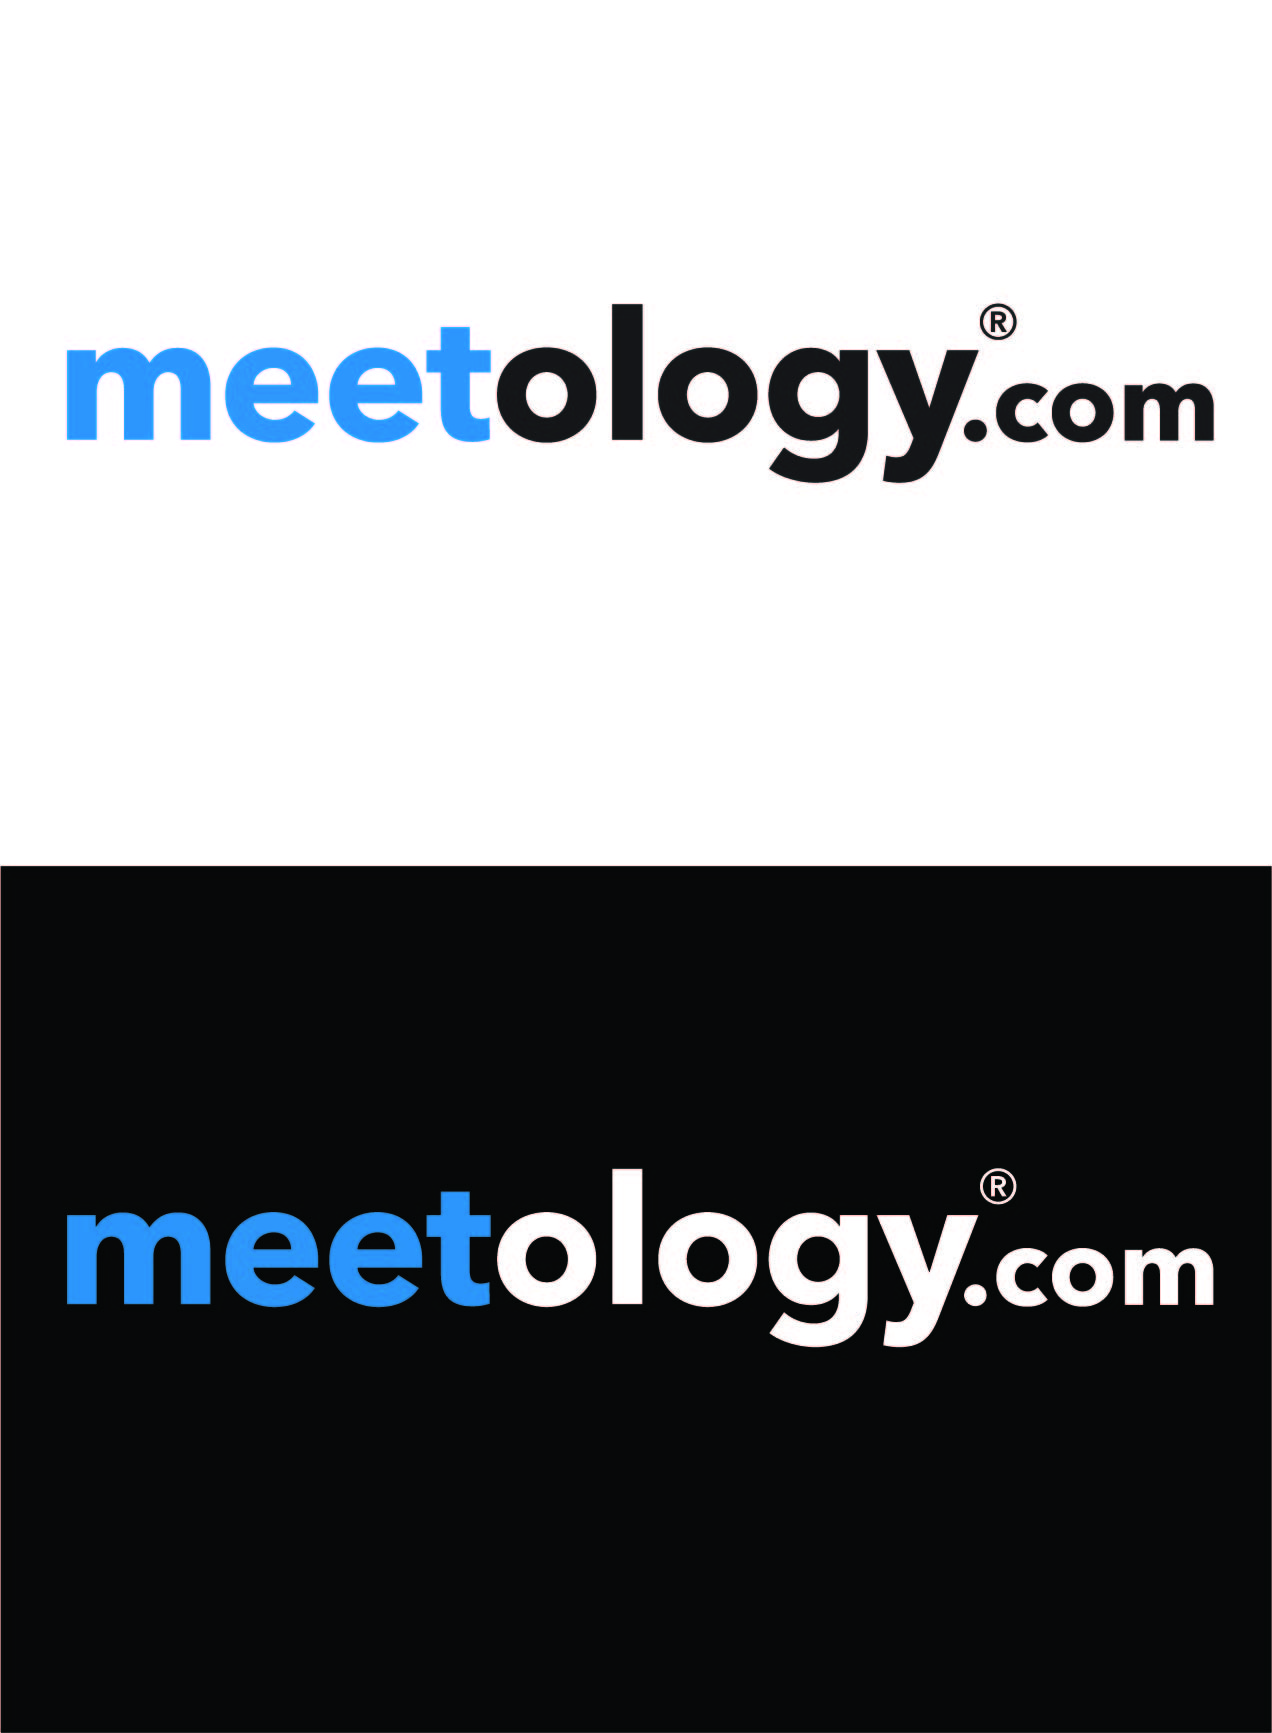 Meetology logo 1.3 with URL